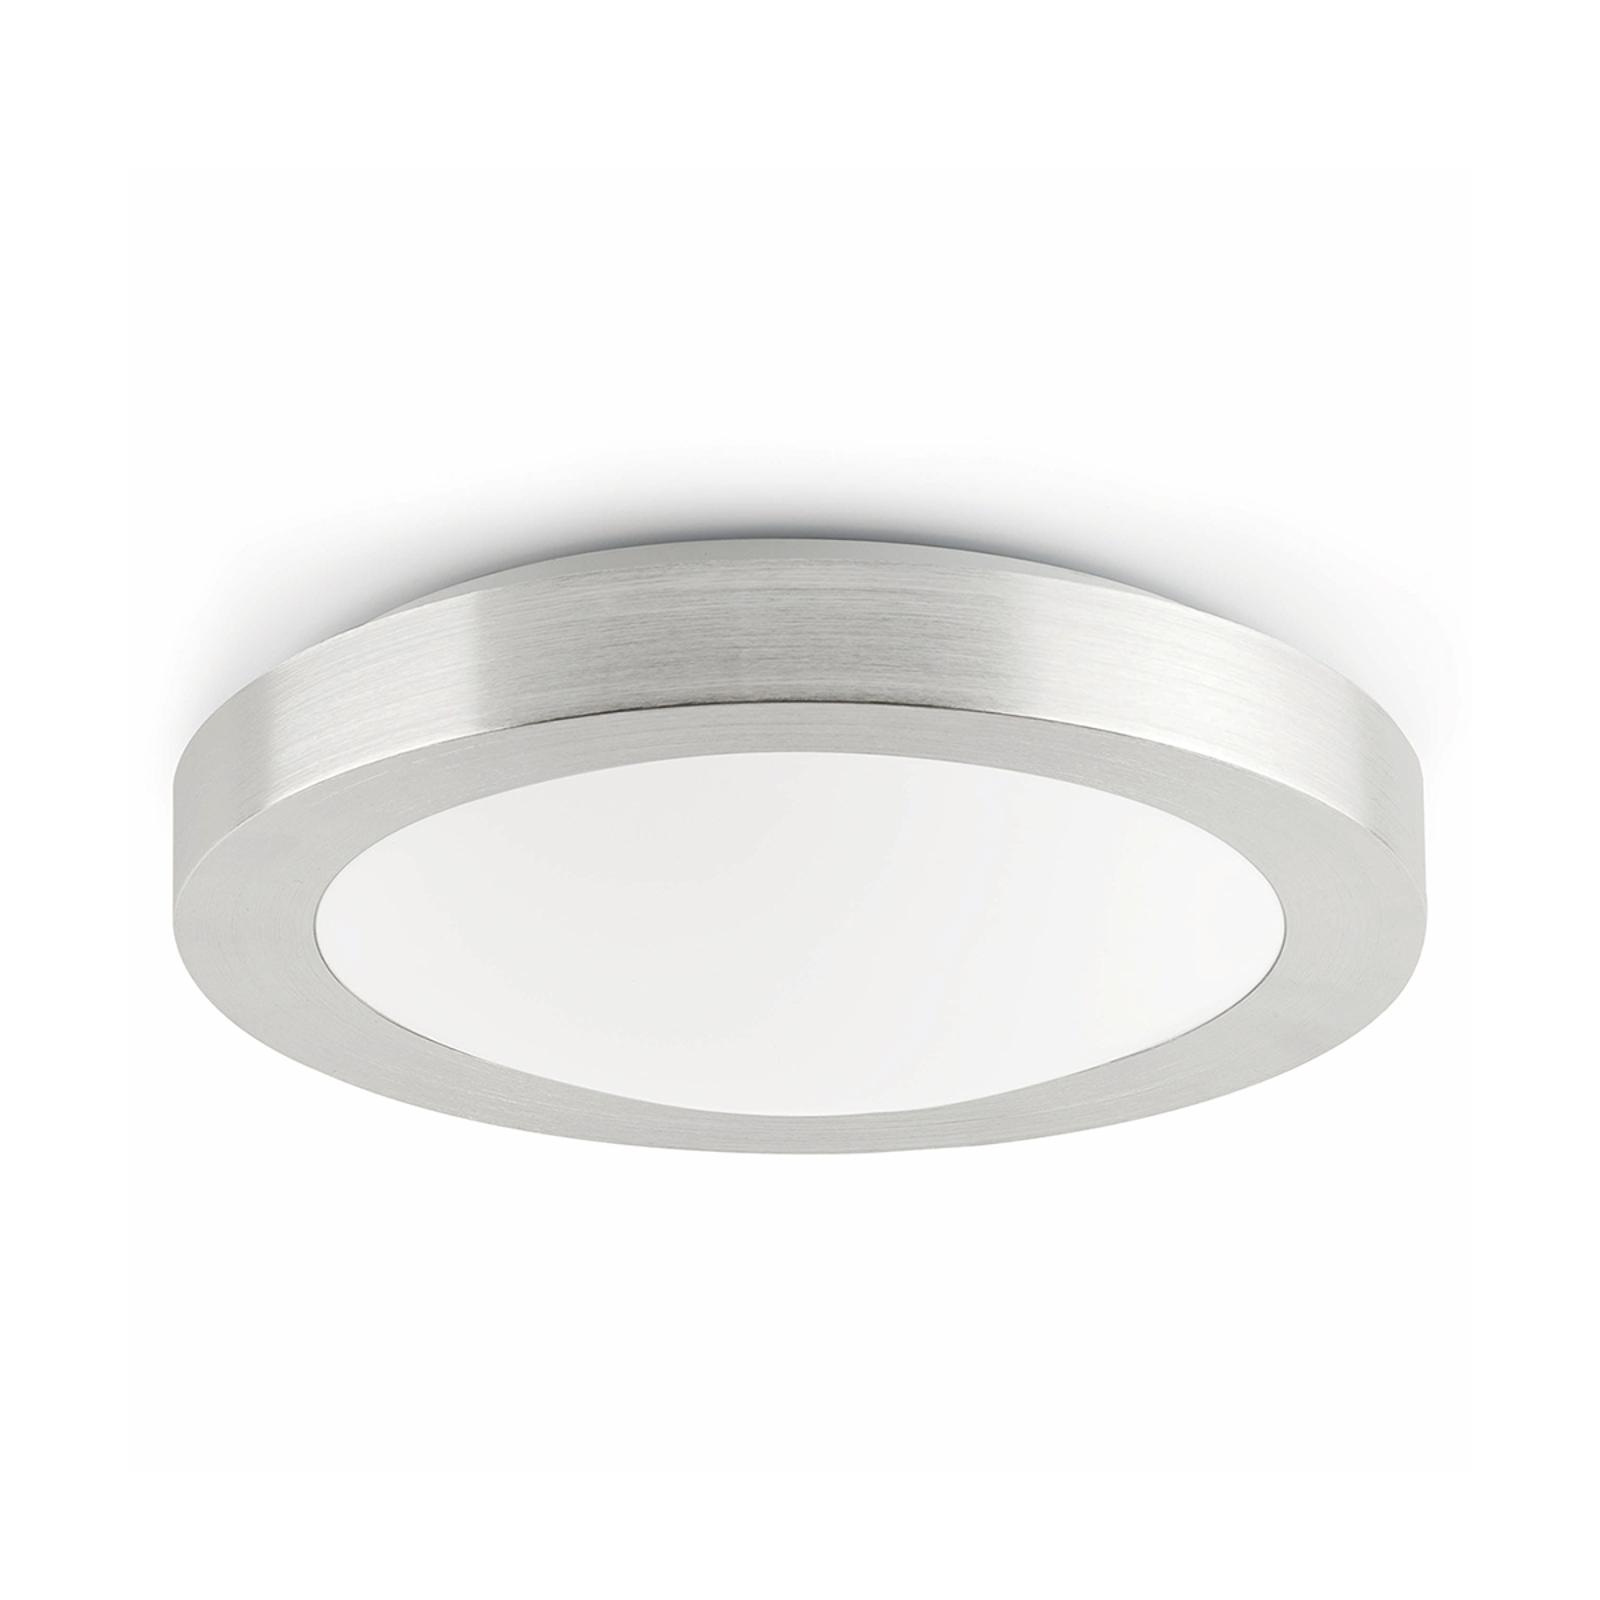 Funkčné stropné svietidlo LOGOS, 35 cm